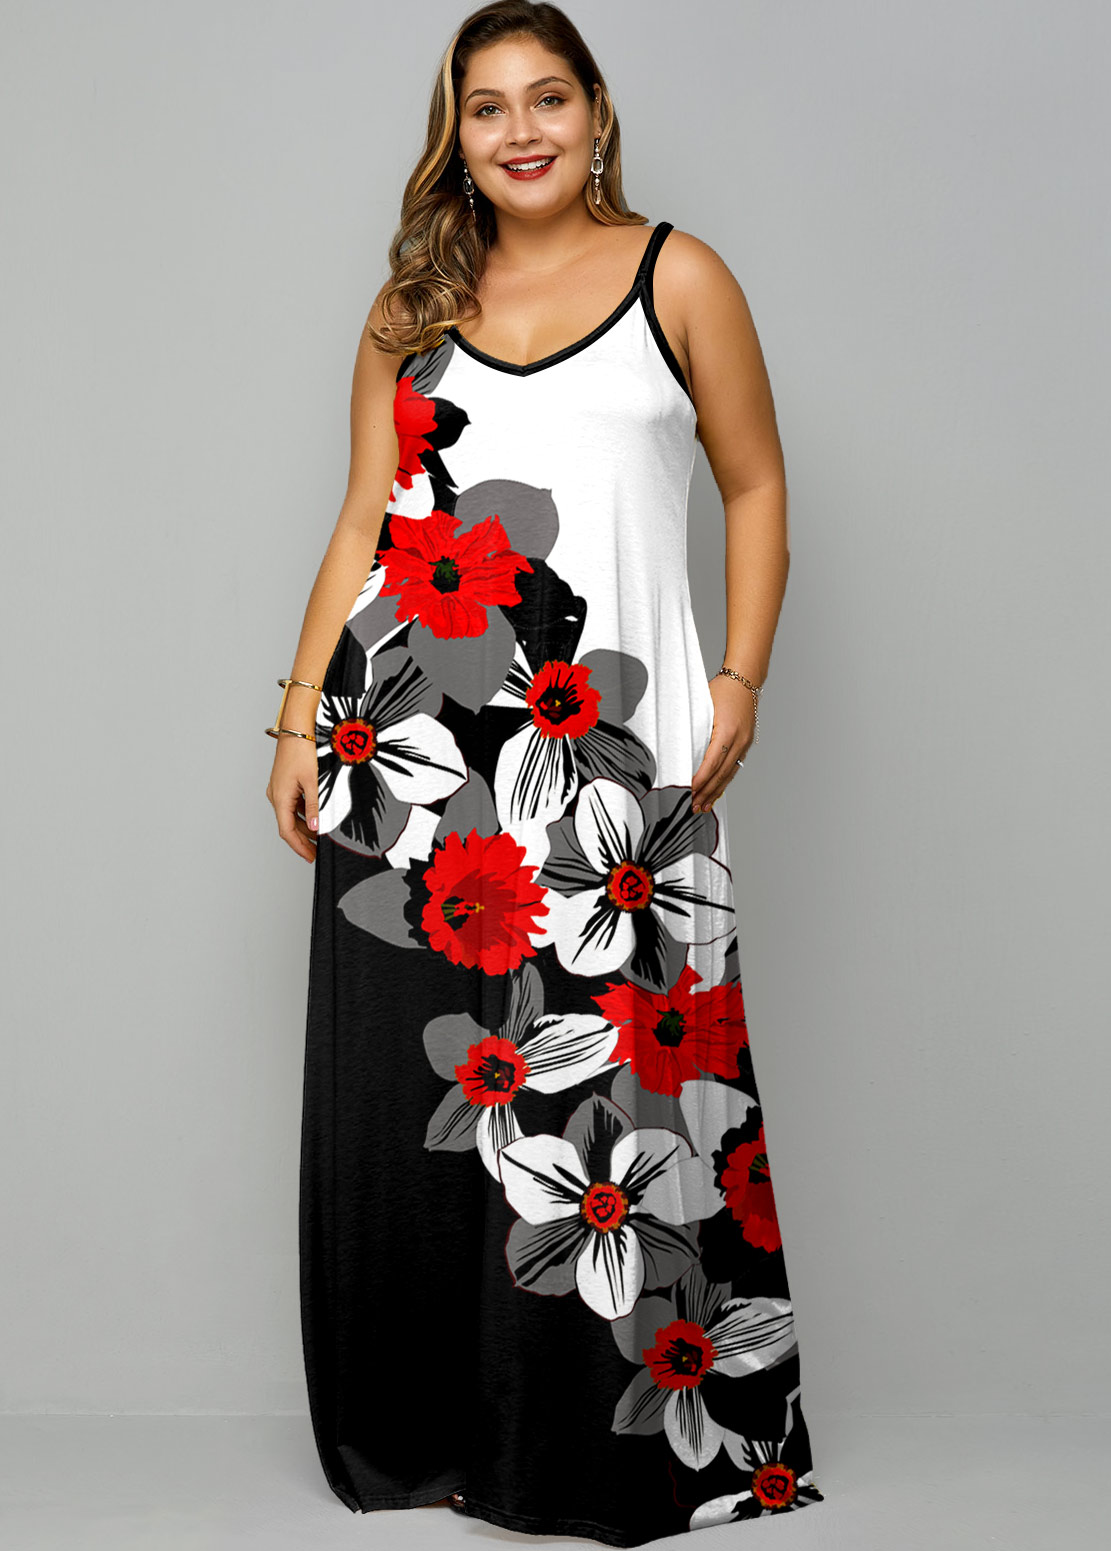 ROTITA Plus Size Spaghetti Strap Floral Print Maxi Dress